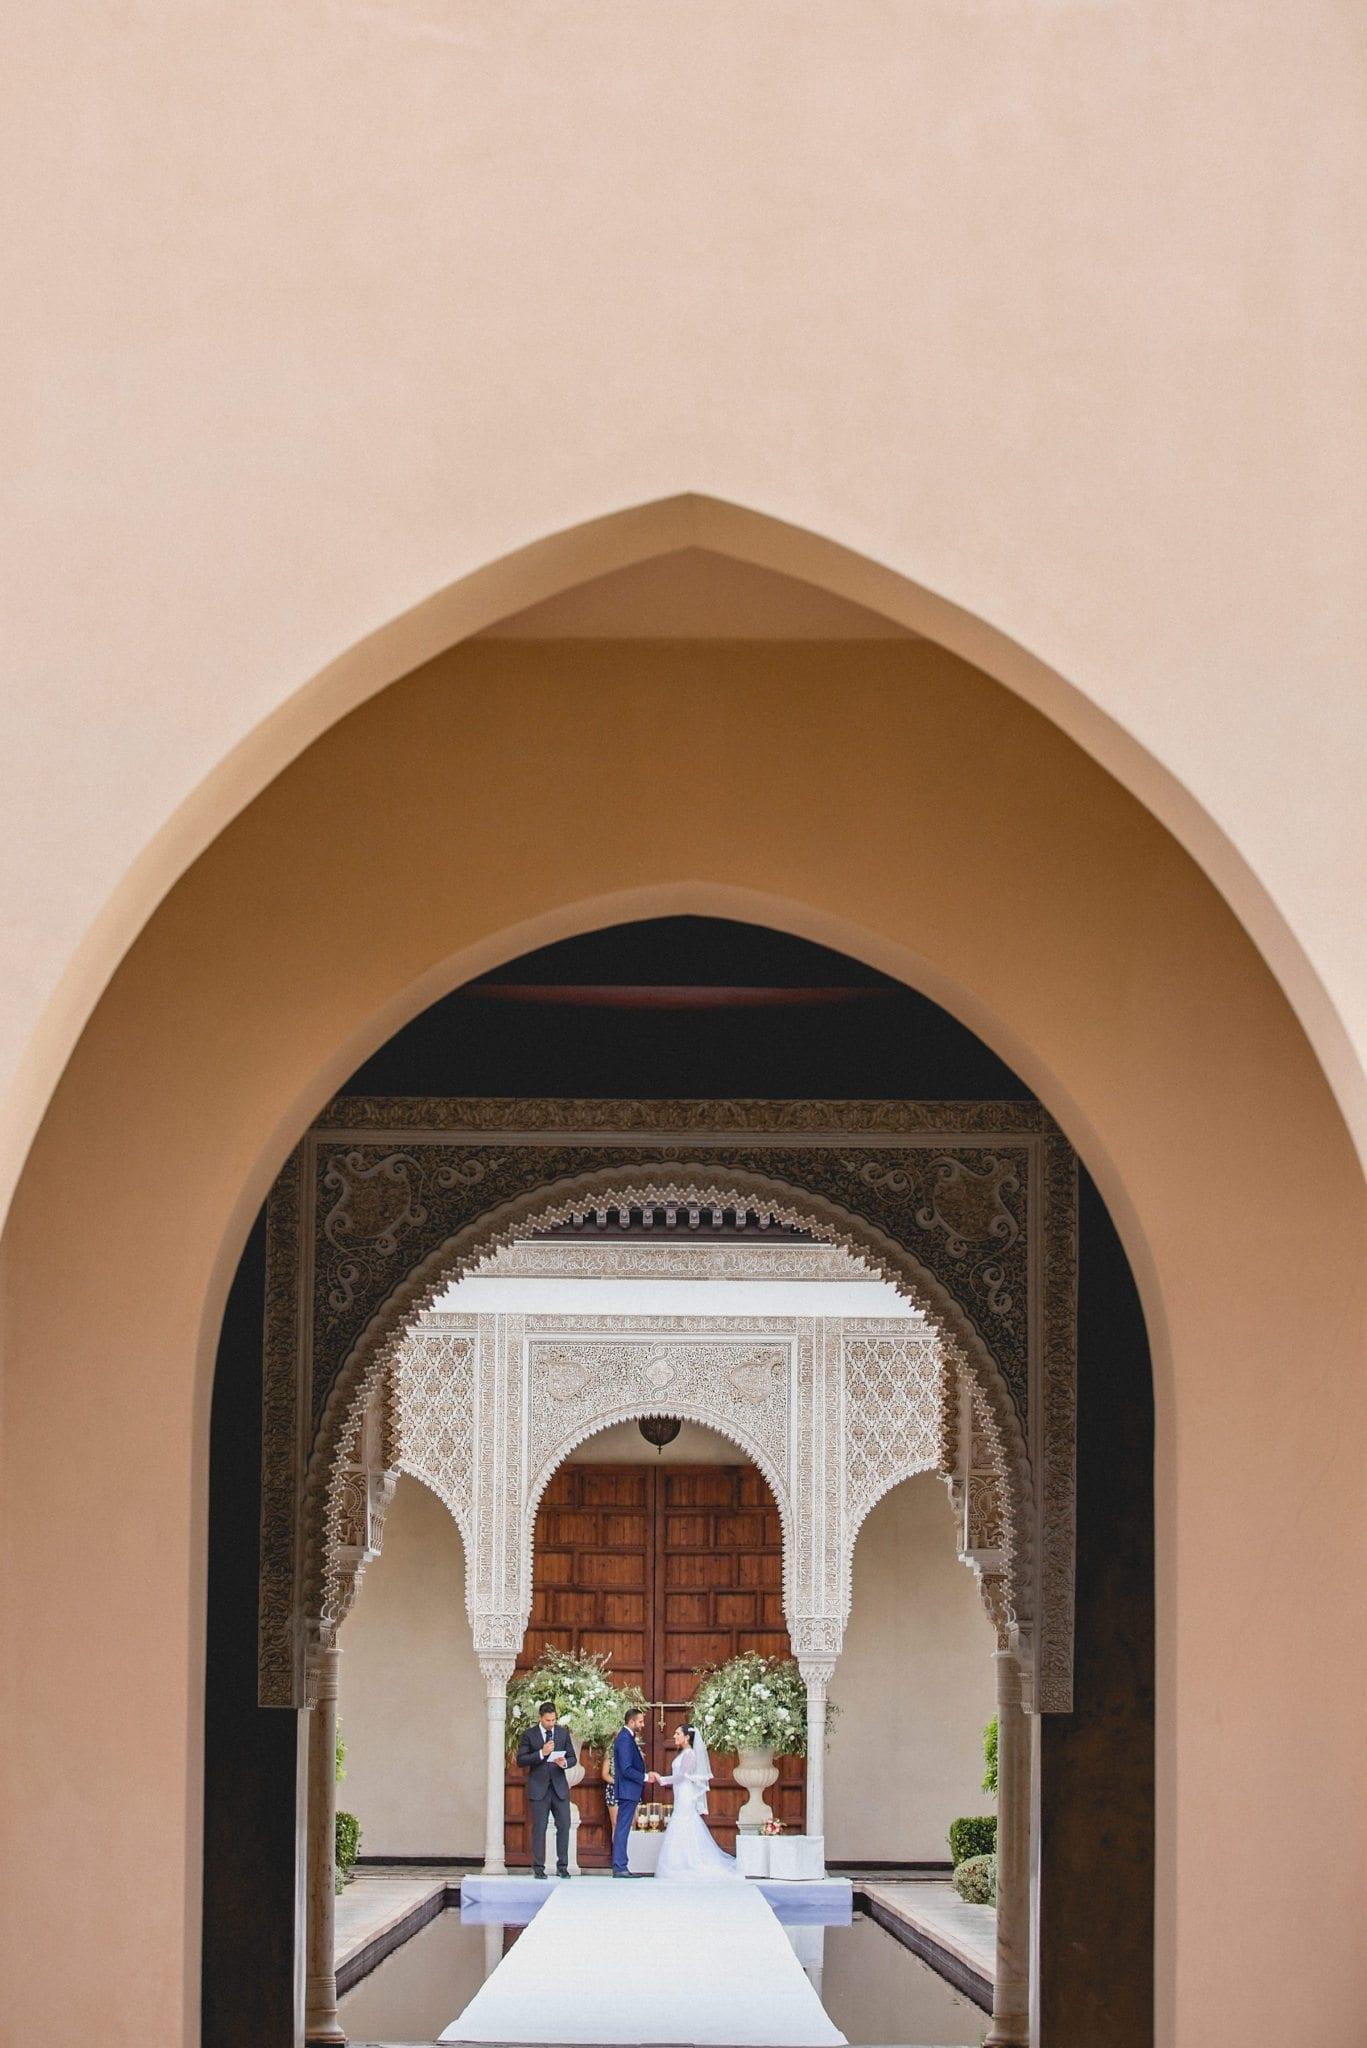 Bride and Groom getting married at their Ksar Char Bagh Luxury Marrakech Destination Wedding